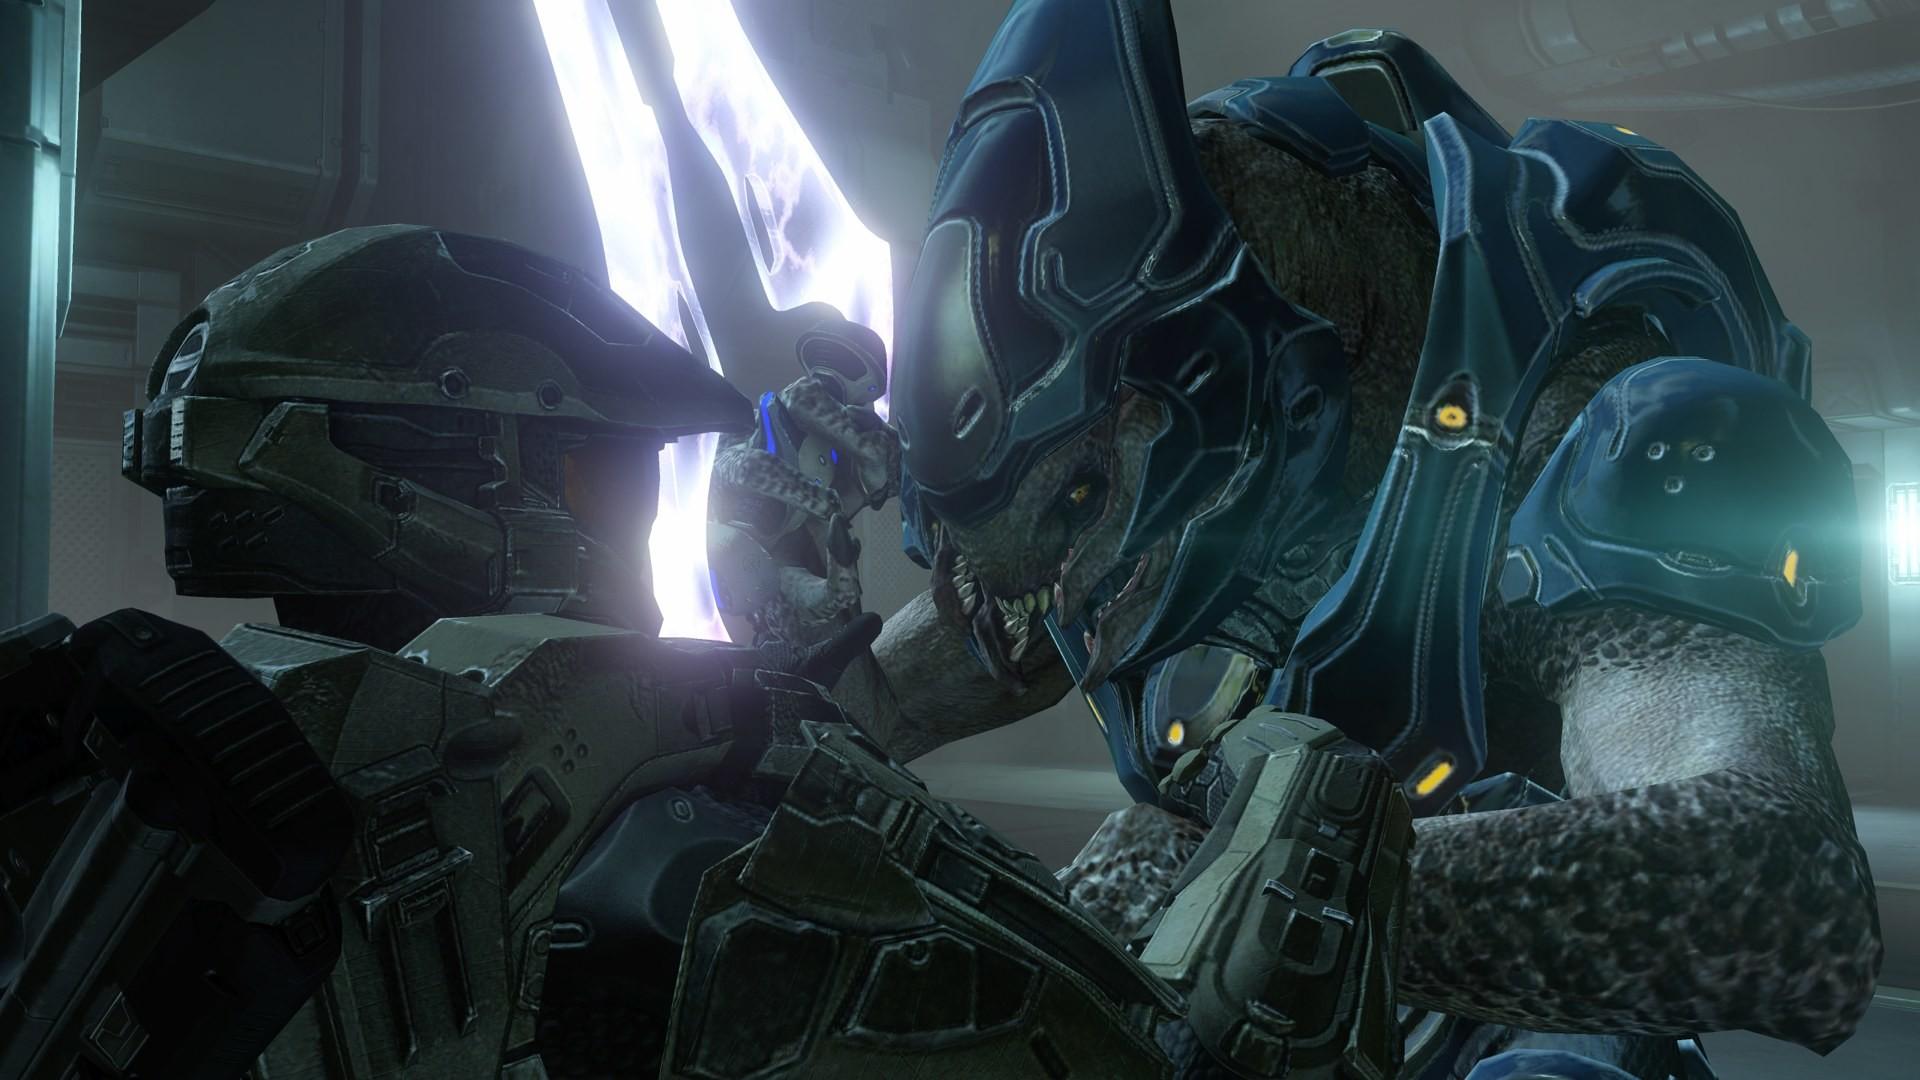 Video Game – Halo 4 Halo Wallpaper